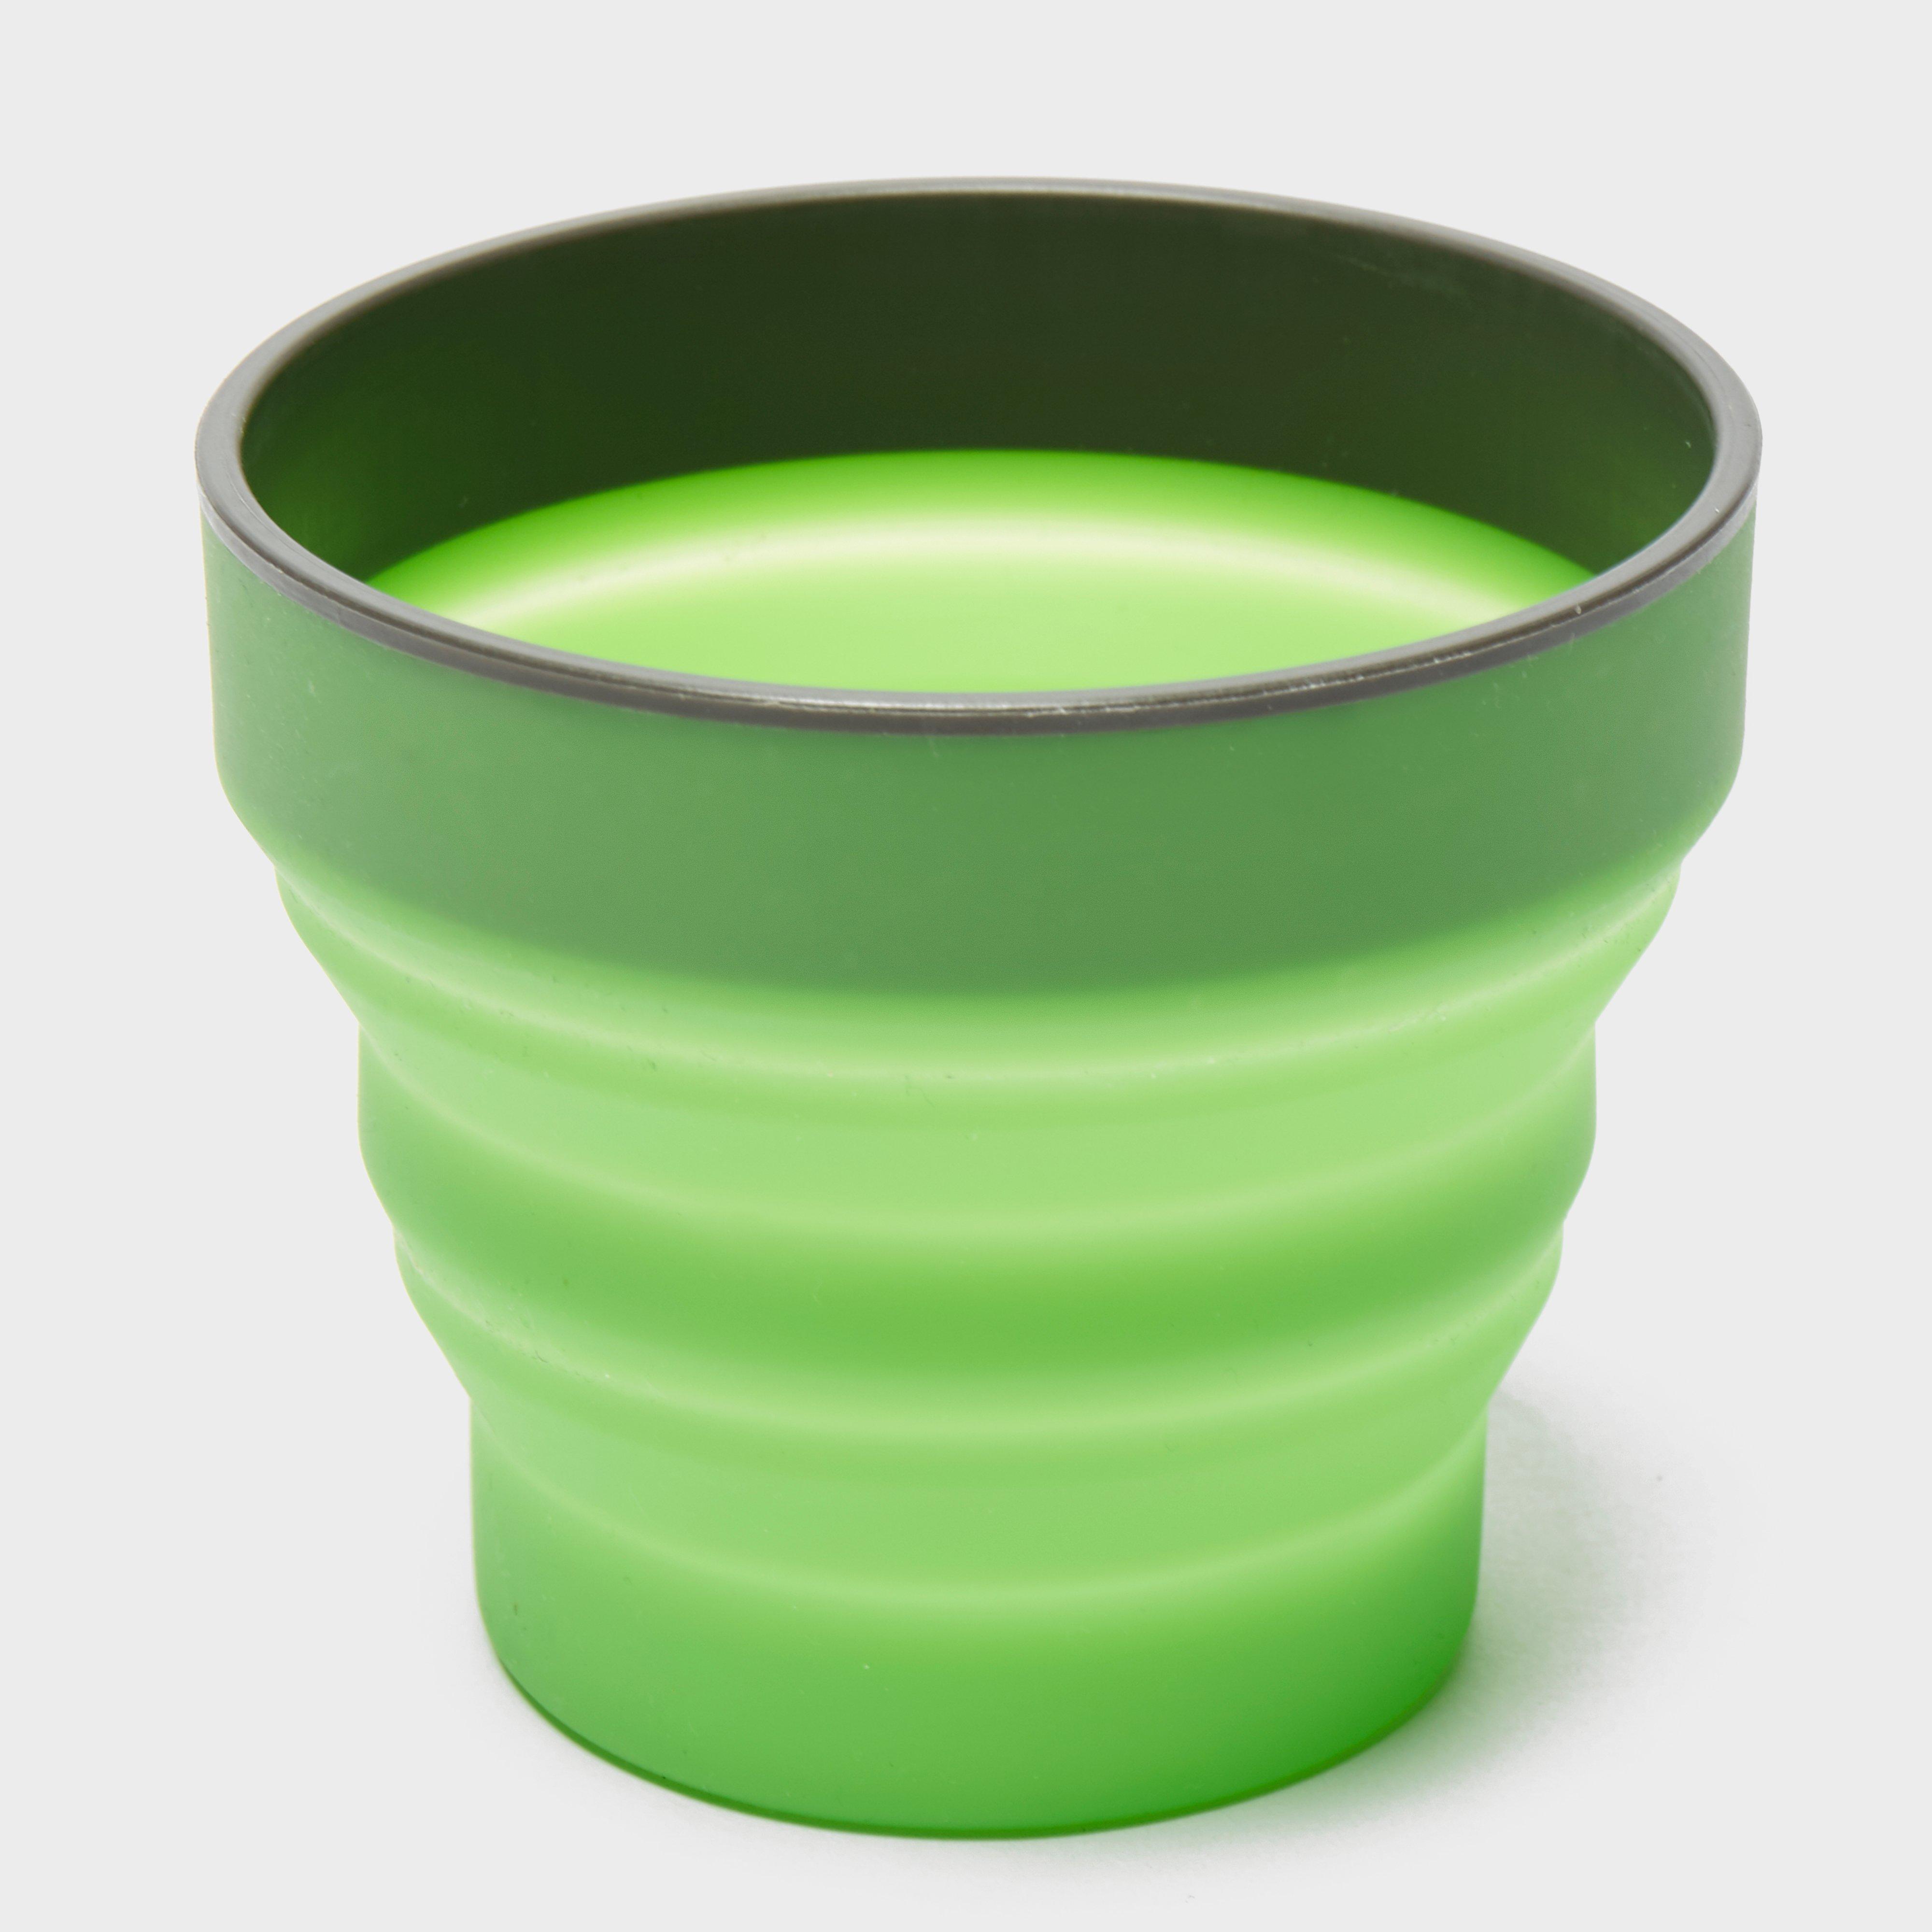 Lifeventure Lifeventure Ellipse Flexi Mug - Green, Green